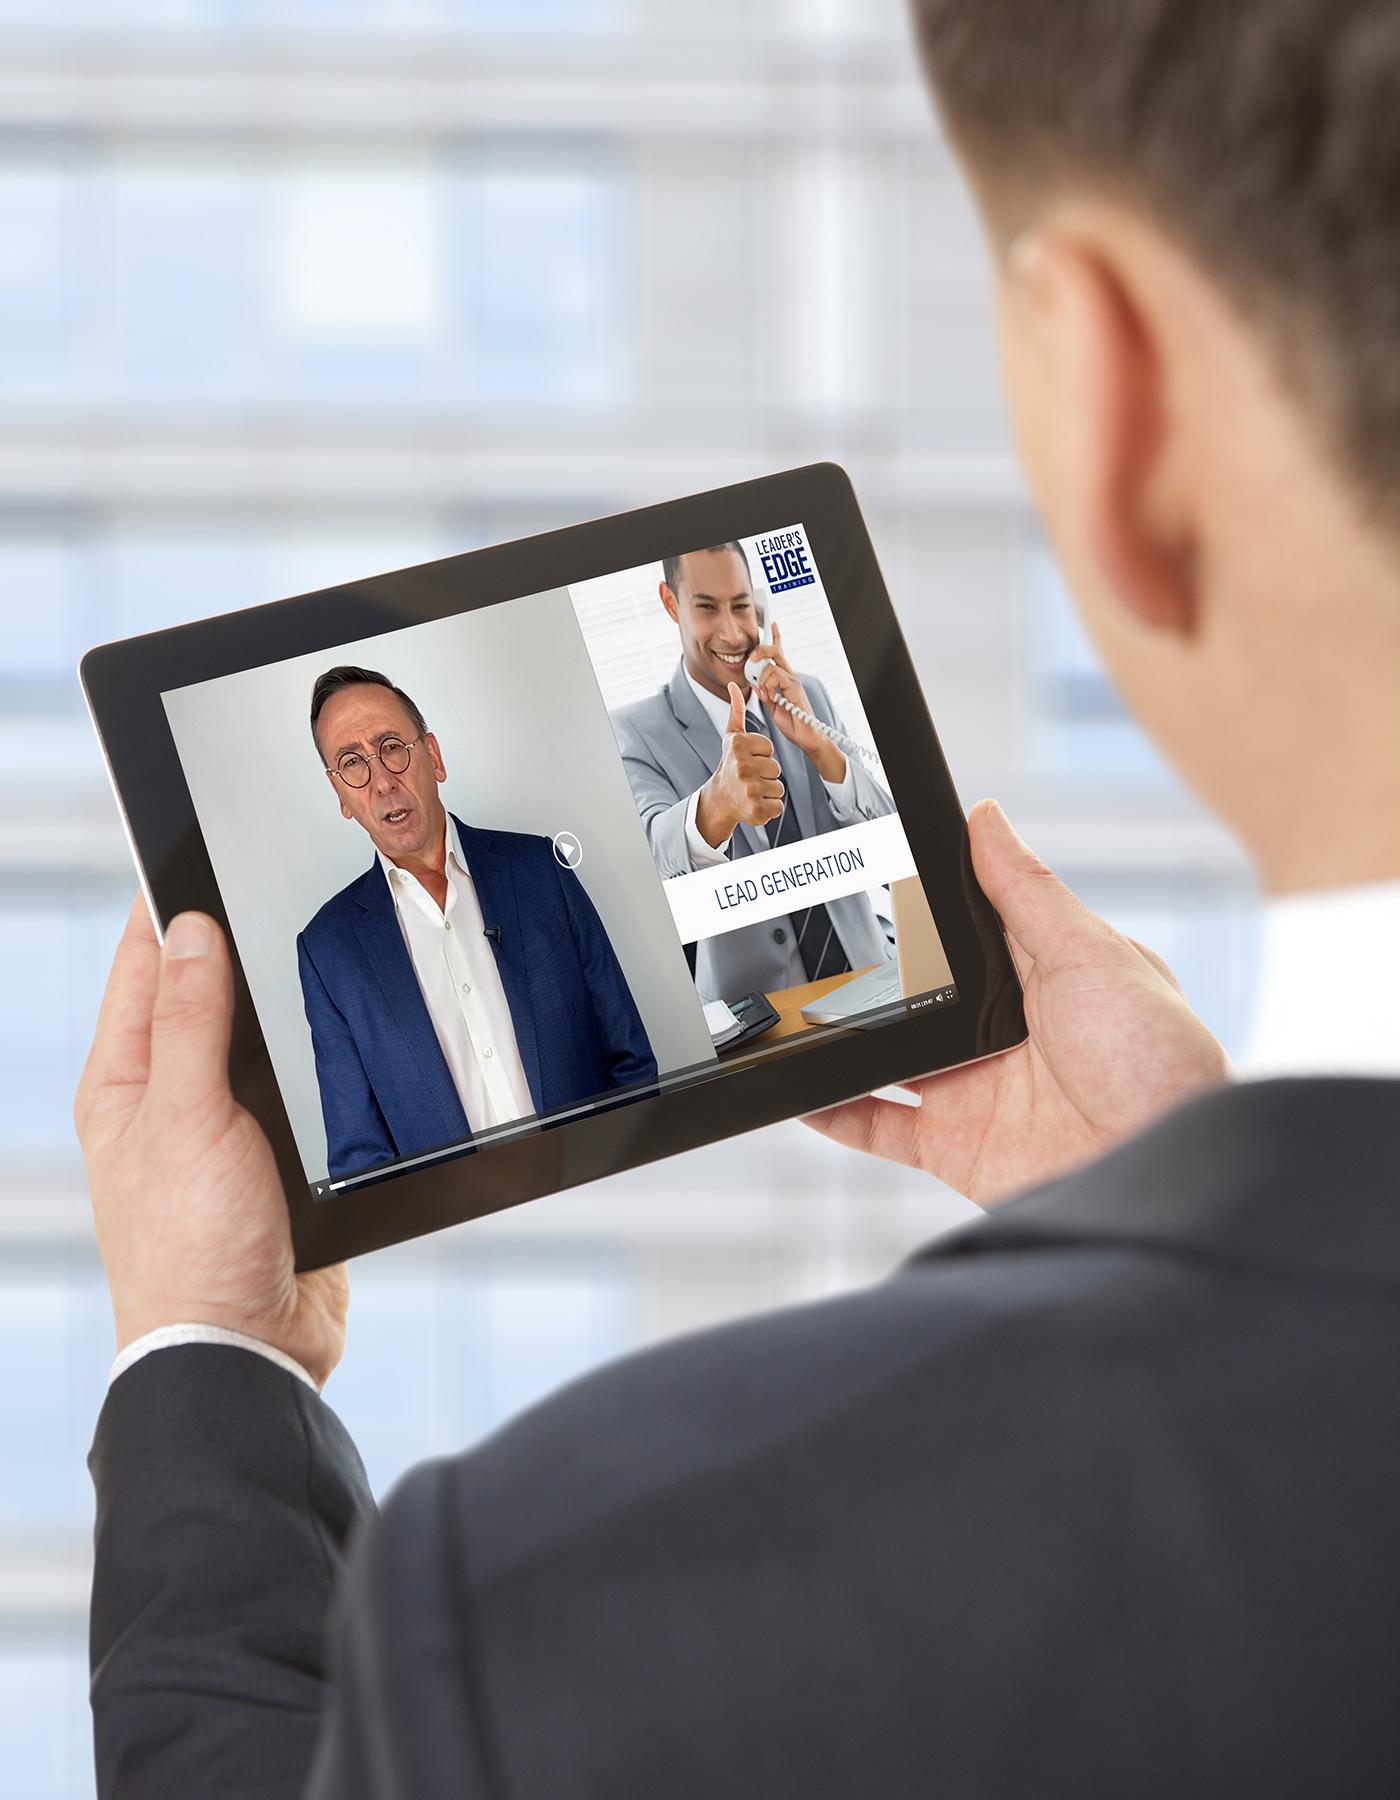 Leader's Edge VT on a tablet